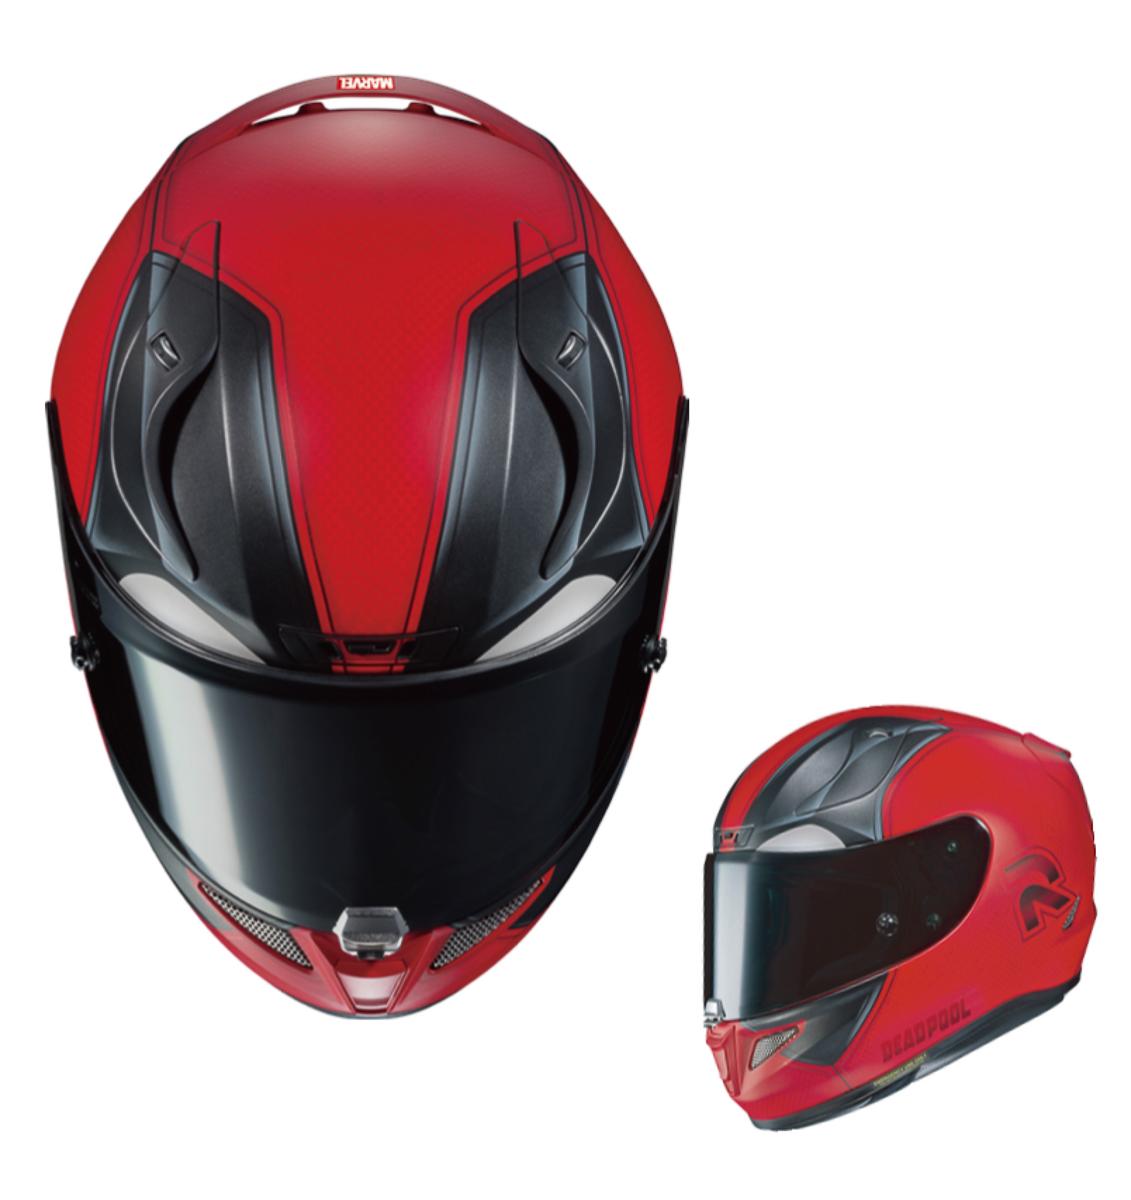 check out the new 2018 hjc rpha 11 deadpool helmet. Black Bedroom Furniture Sets. Home Design Ideas